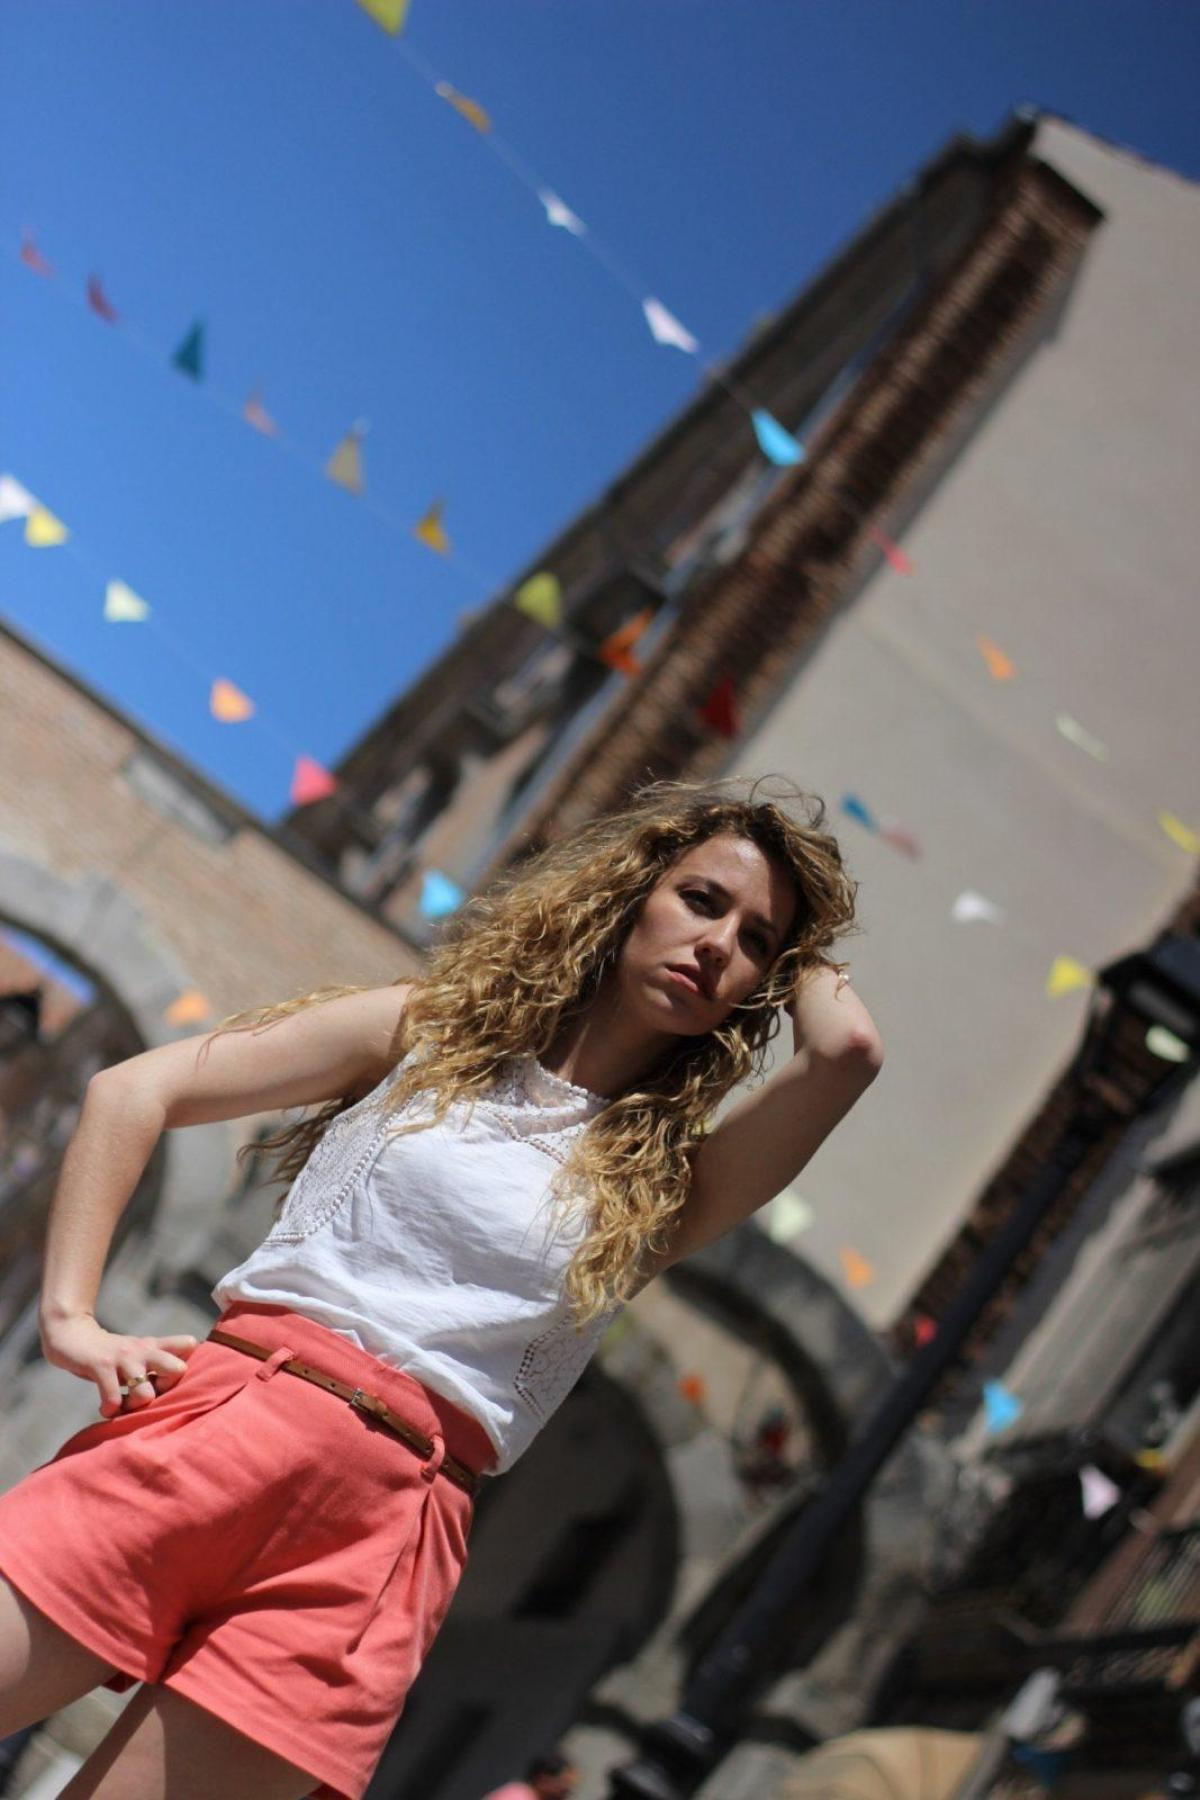 marikowskaya street style jennifer shorts vestir (2)